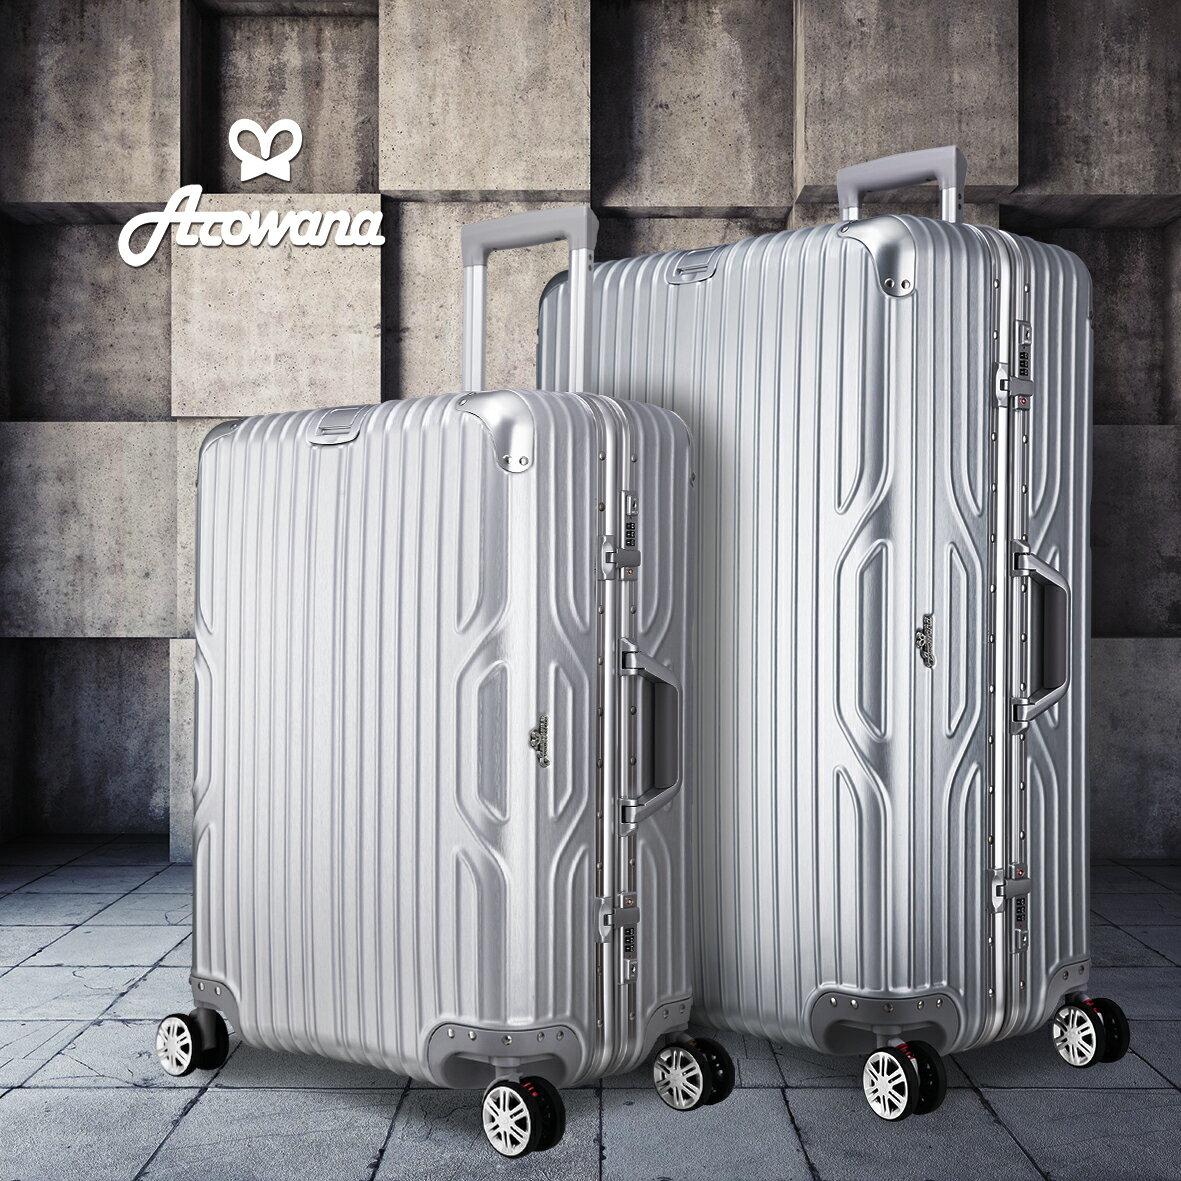 【Arowana】極致川旅25+29吋立體拉絲鋁框避震輪旅行箱/行李箱(多色任選)【H80875】